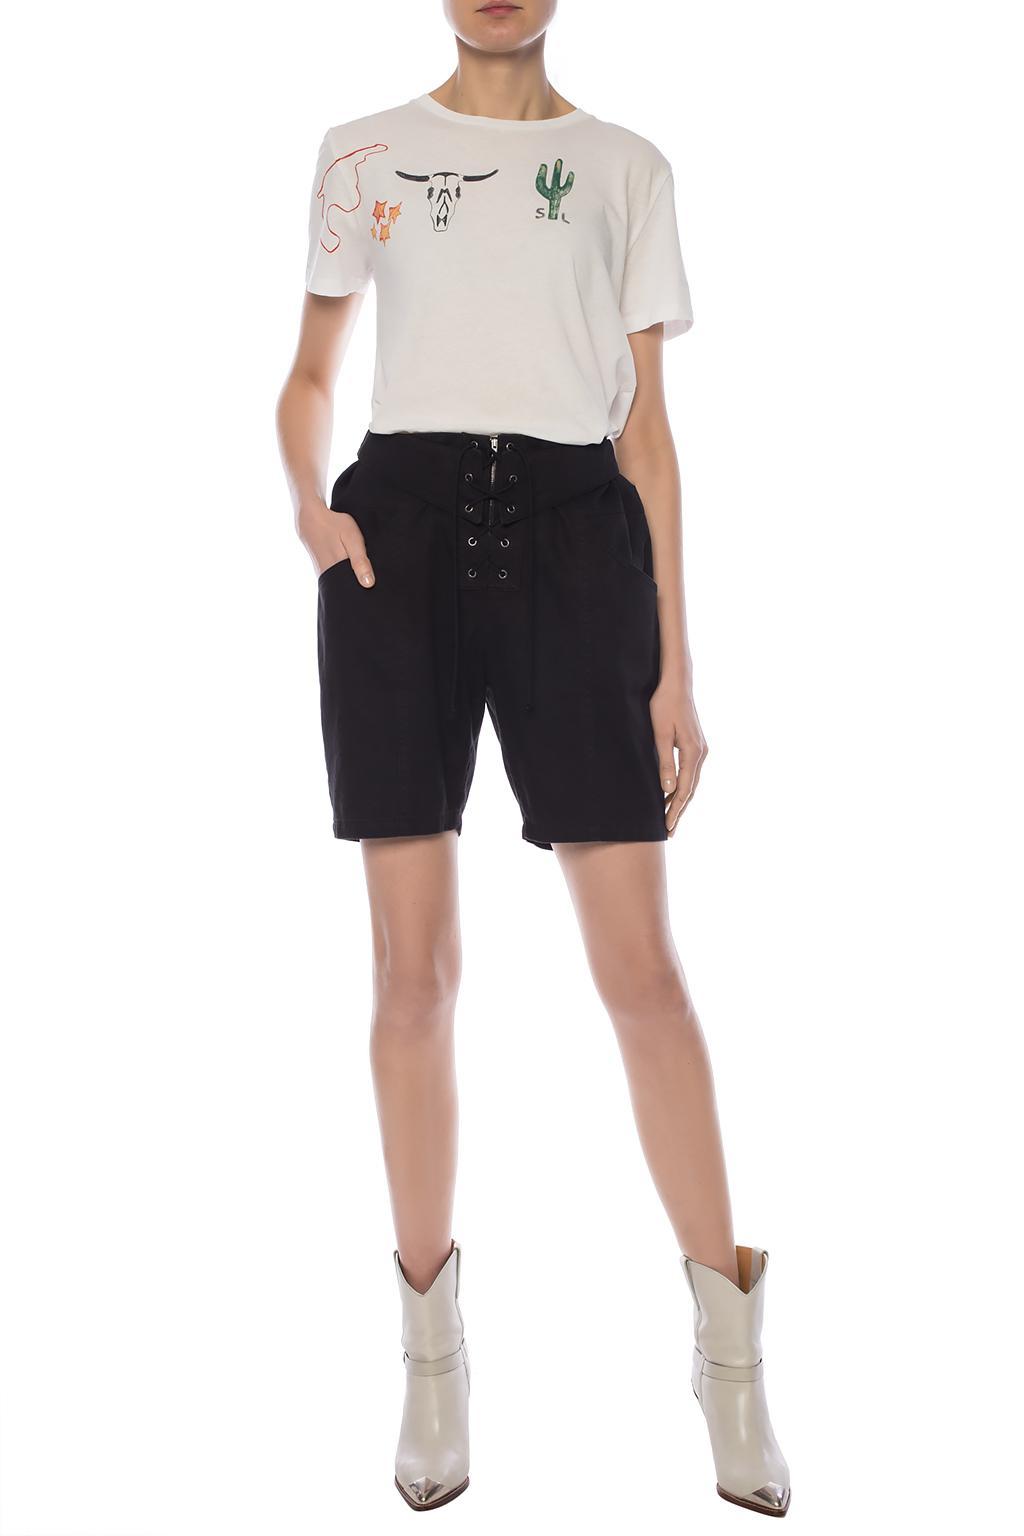 Saint Laurent Drawstring shorts